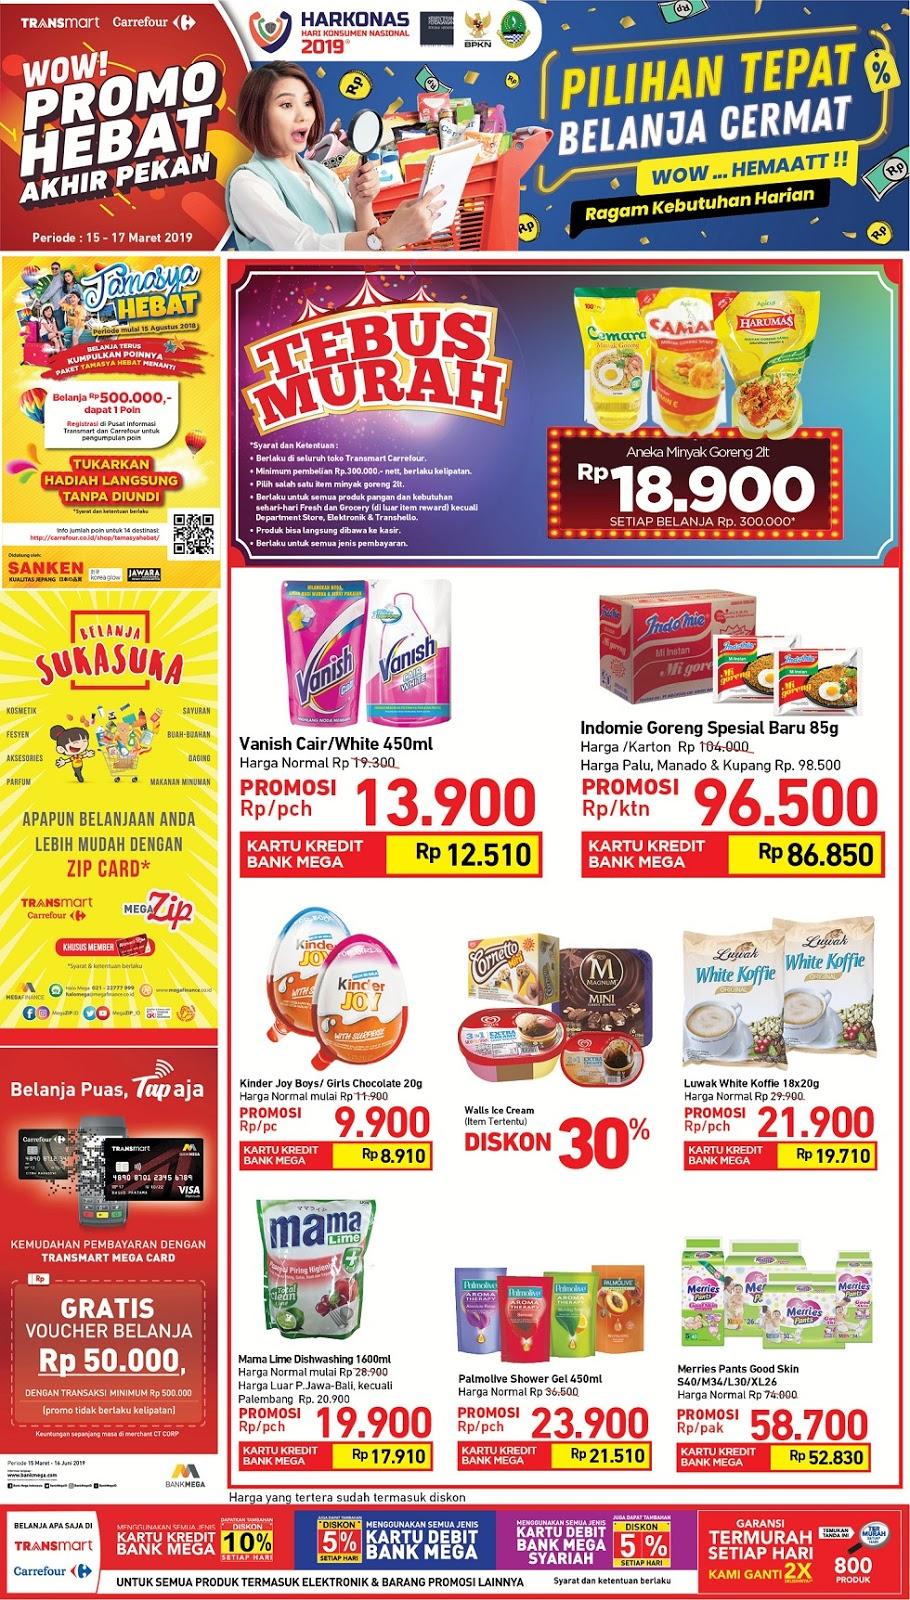 #Transmart #Carrefour - #Promo #Katalog JSM Periode 15 - 17 Maret 2019